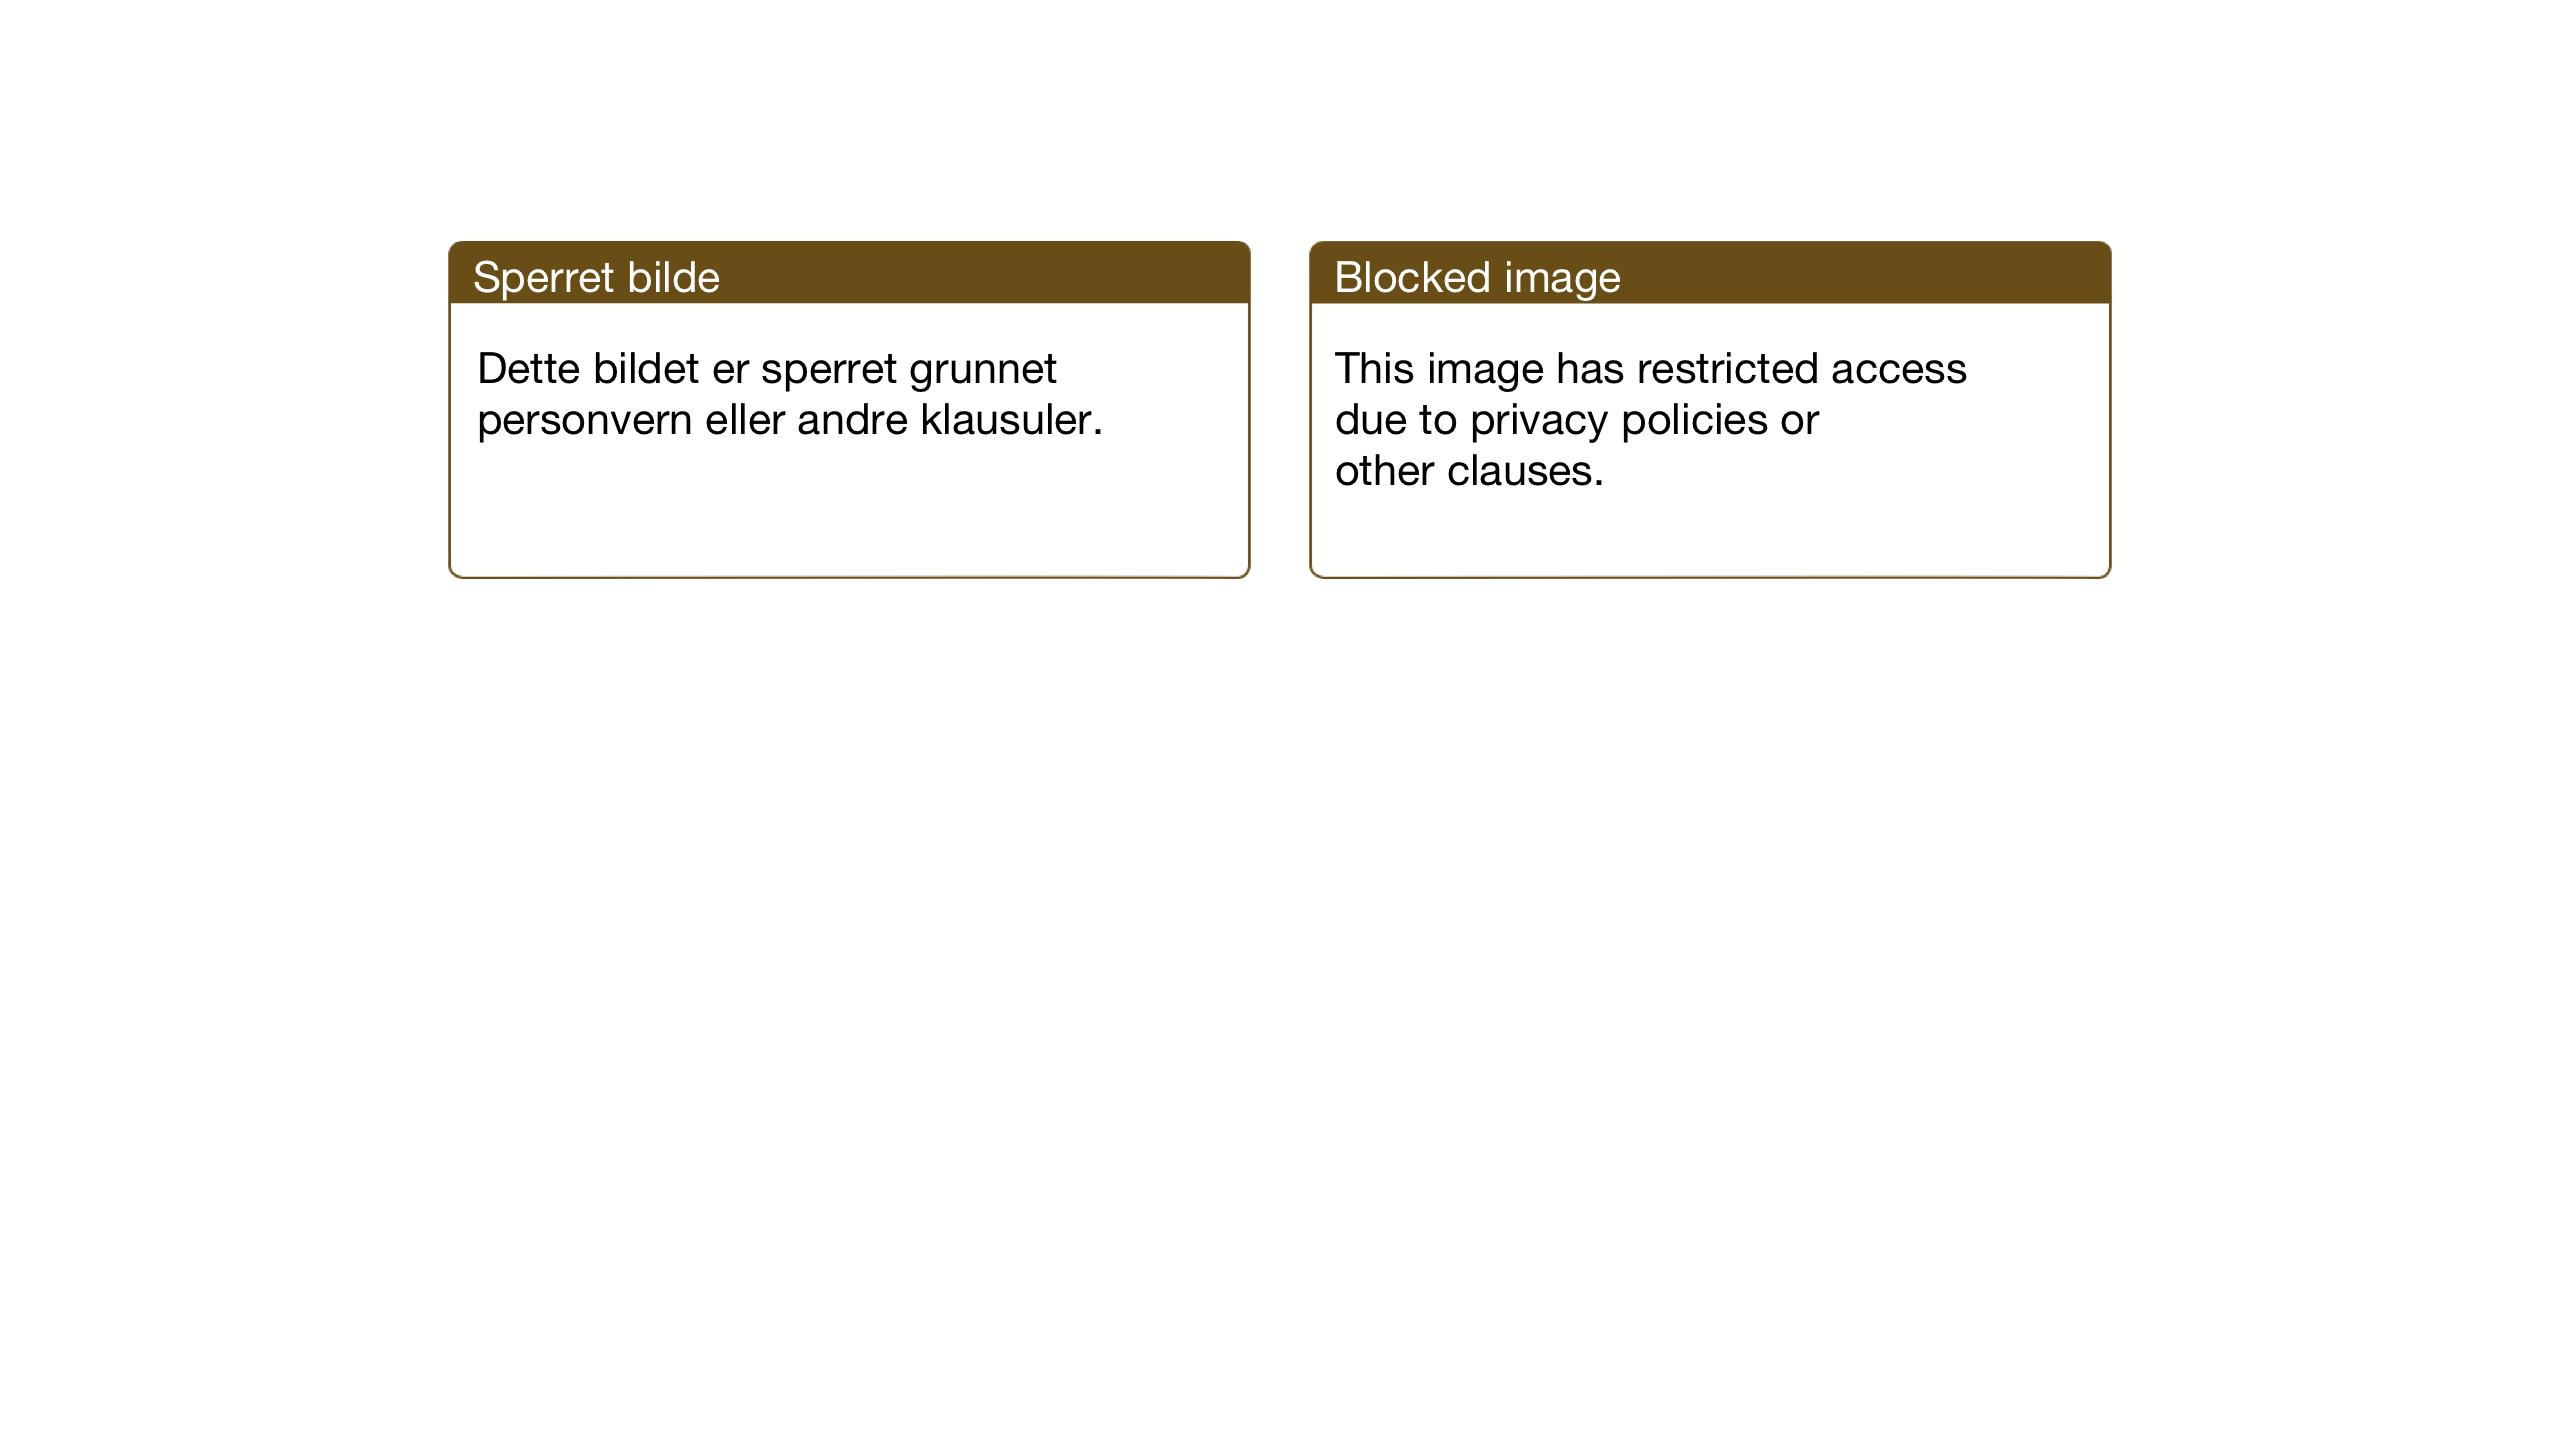 SAT, Ministerialprotokoller, klokkerbøker og fødselsregistre - Nordland, 847/L0680: Klokkerbok nr. 847C08, 1930-1947, s. 206